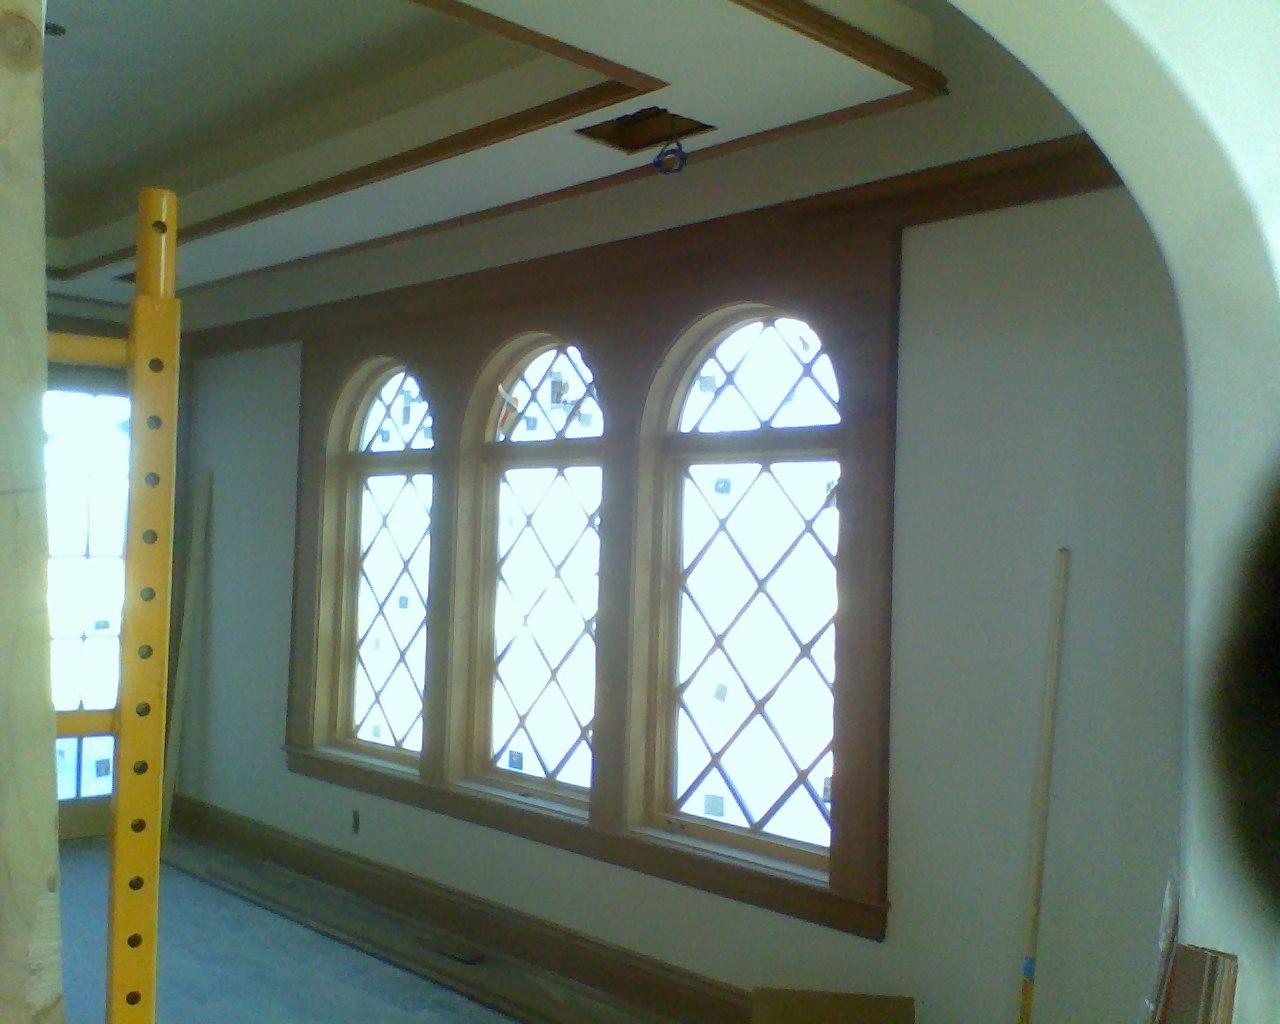 Current Interior Trim Job Carpentry Picture Post Contractor Talk